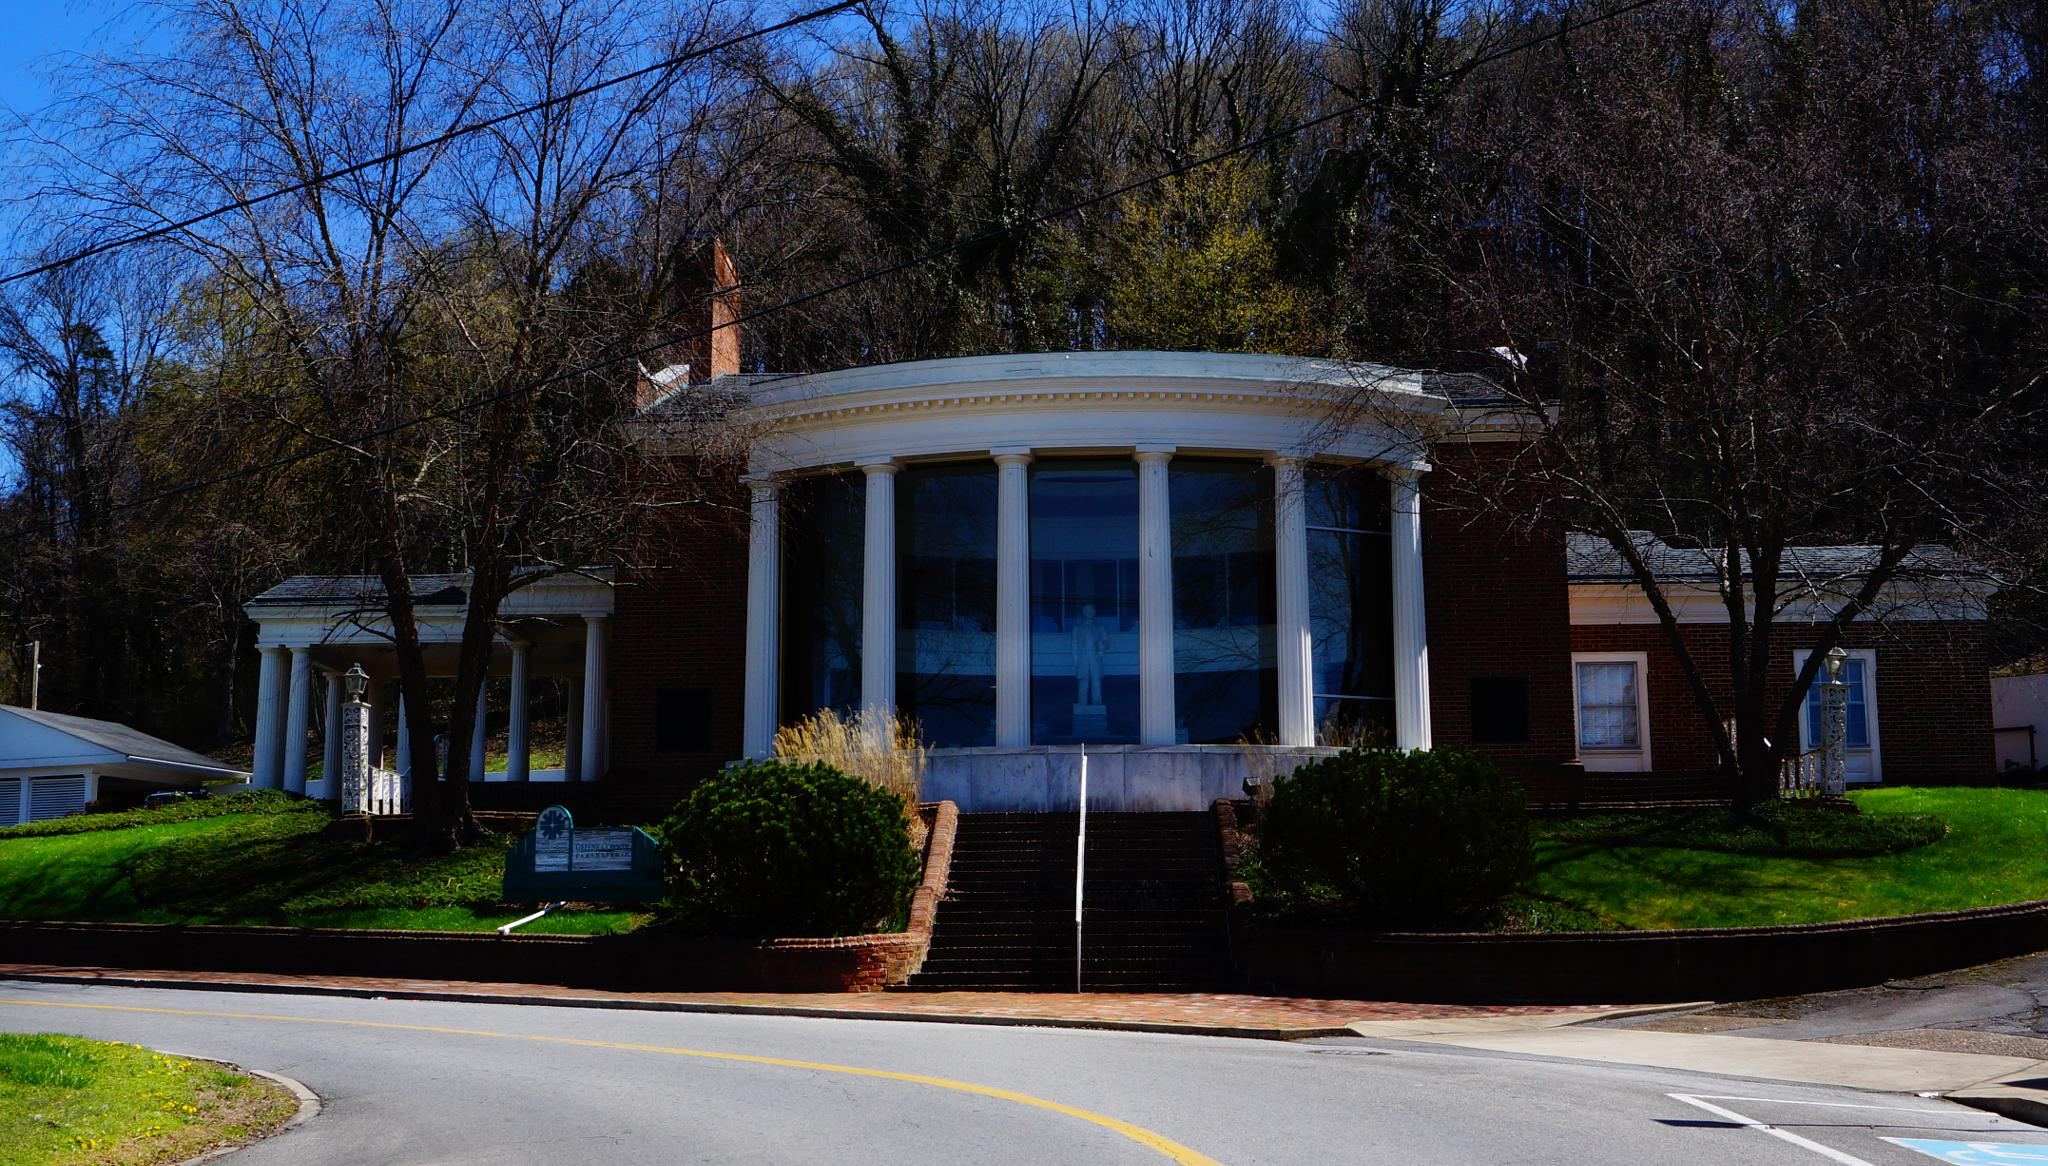 Historic Greenville by Jutta Angelika Reed